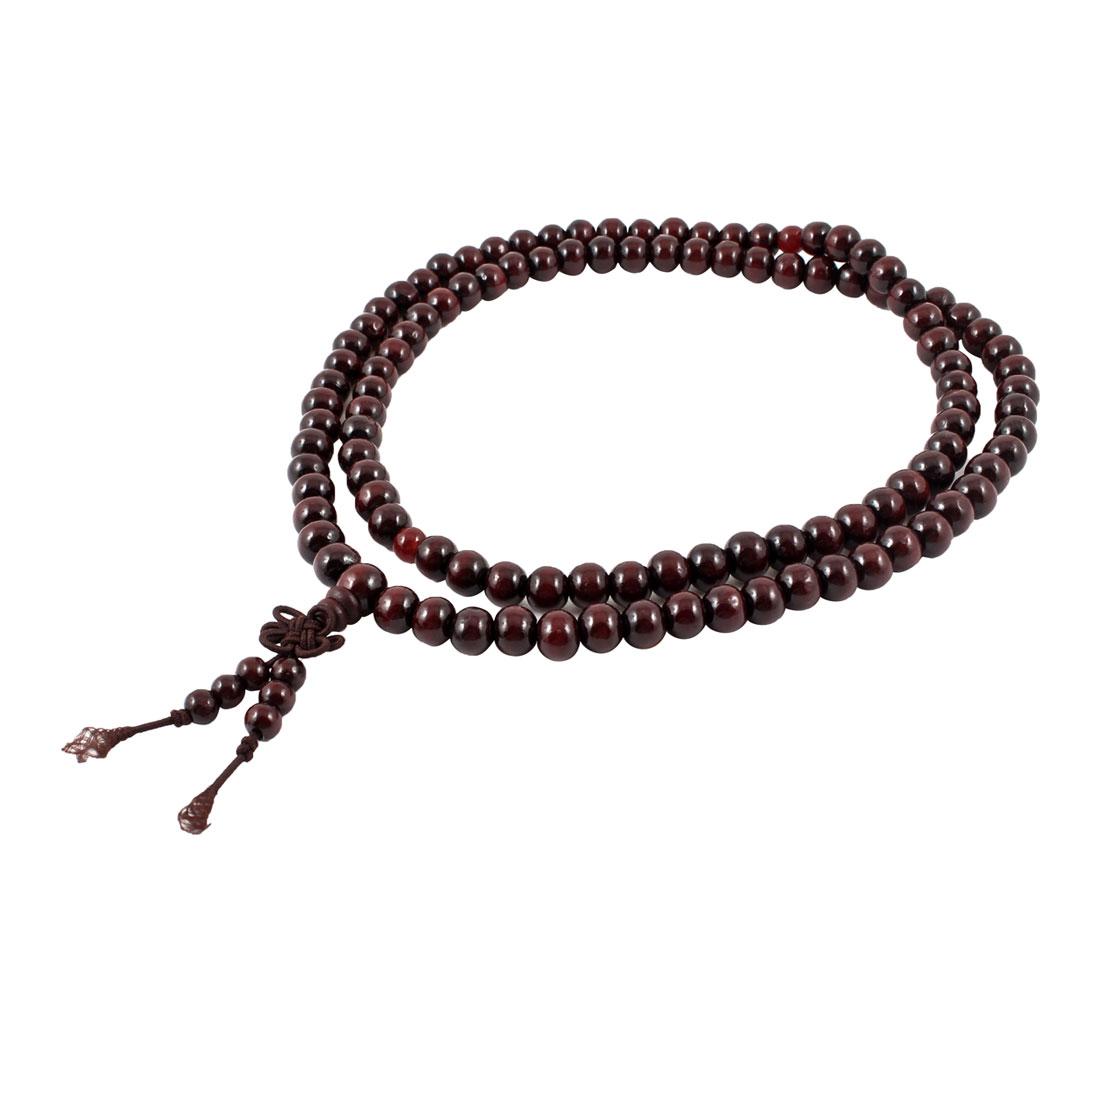 Multifunction Round Beads Elastic Sandalwood Mala Necklace Dark Brown